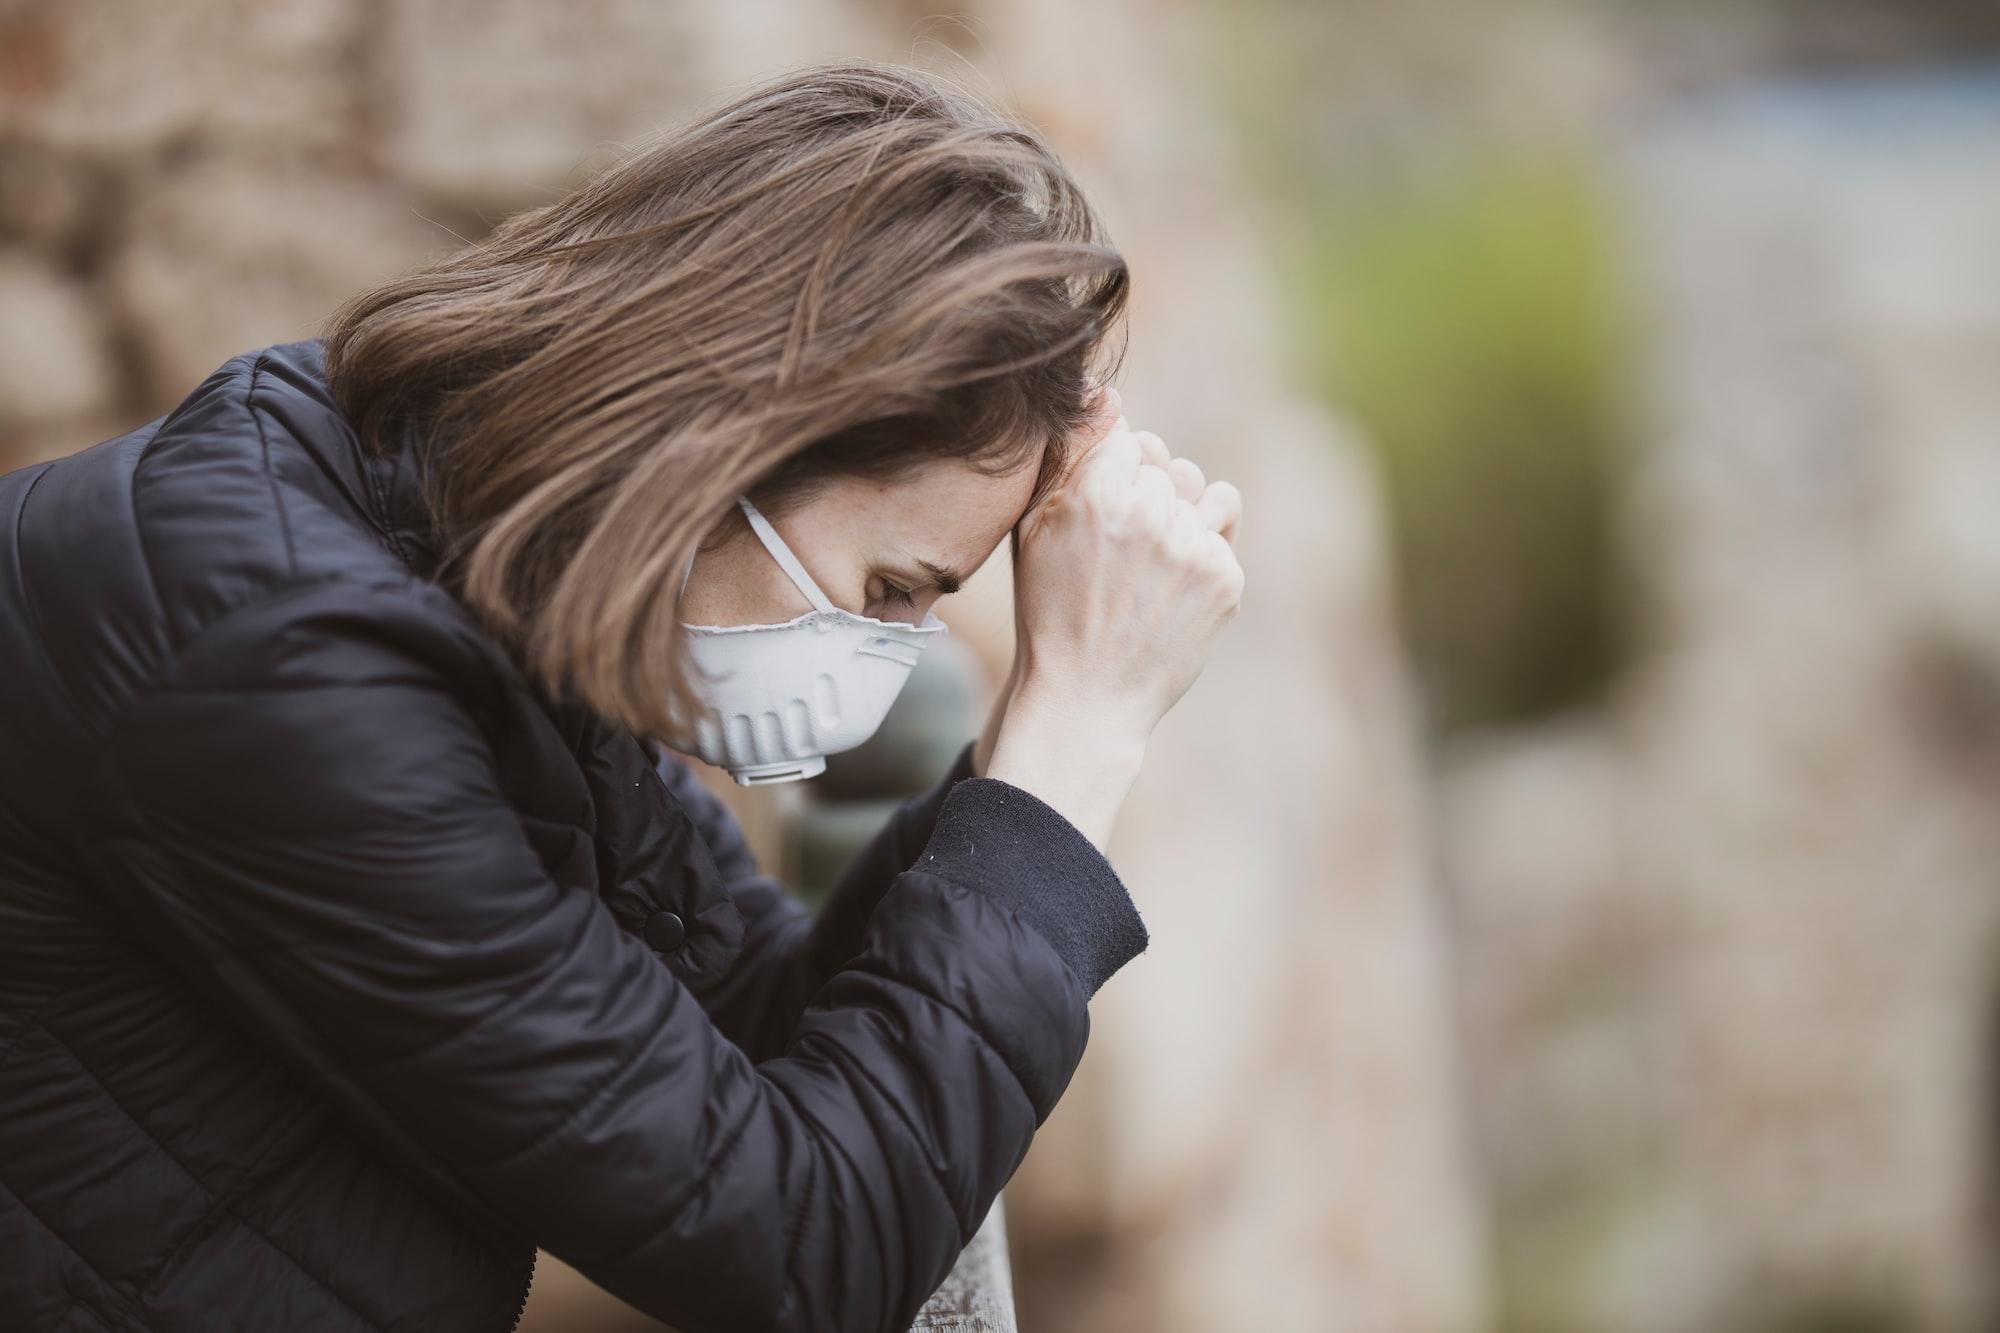 Woman wearing face mask during coronavirus outbreak